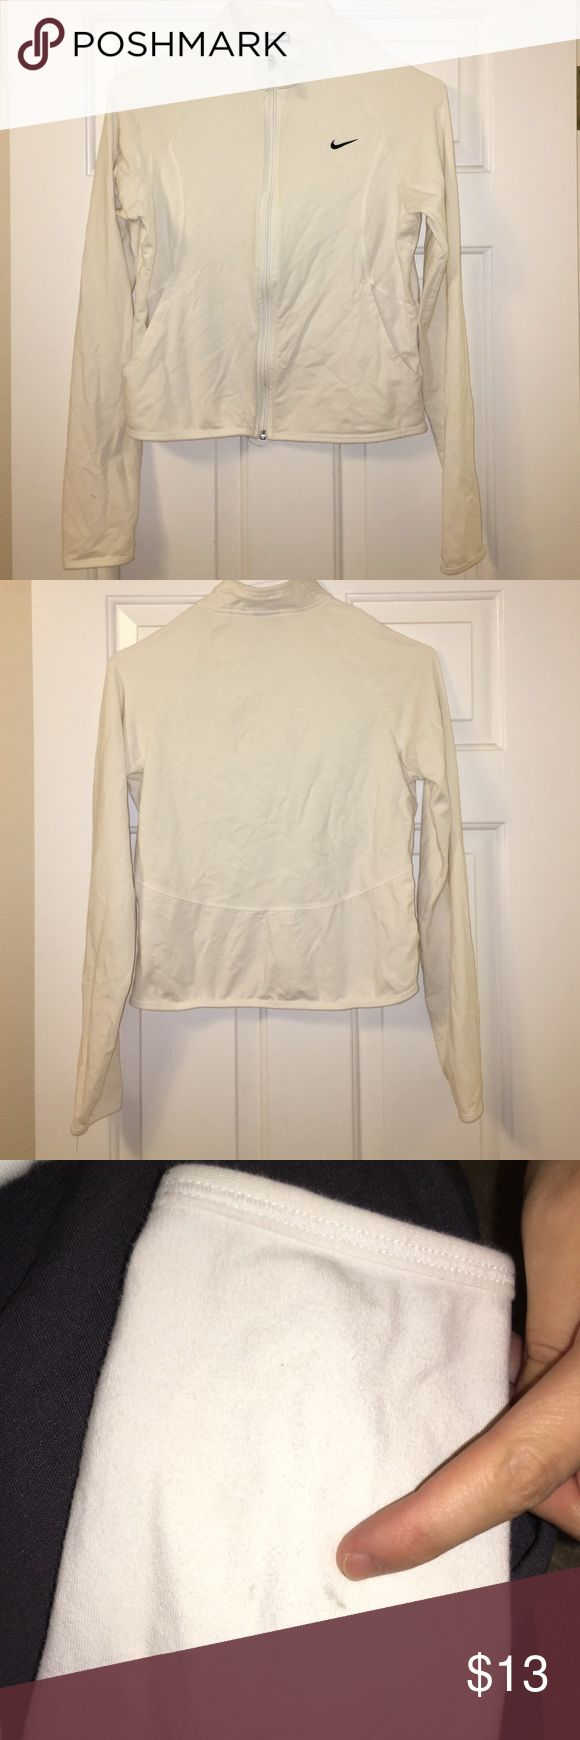 Nike Sweatshirt White ish/ cream•zip up•Nike•size medium•has a tiny mark on the sleeve• Nike Tops Sweatshirts & Hoodies